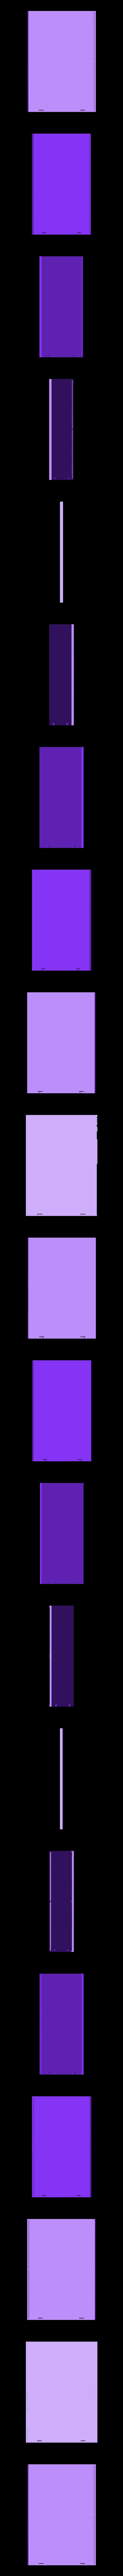 TownHero.stl Télécharger fichier STL gratuit Boss Monster Dungeon Board & Card Holders • Plan pour impression 3D, jbrum360